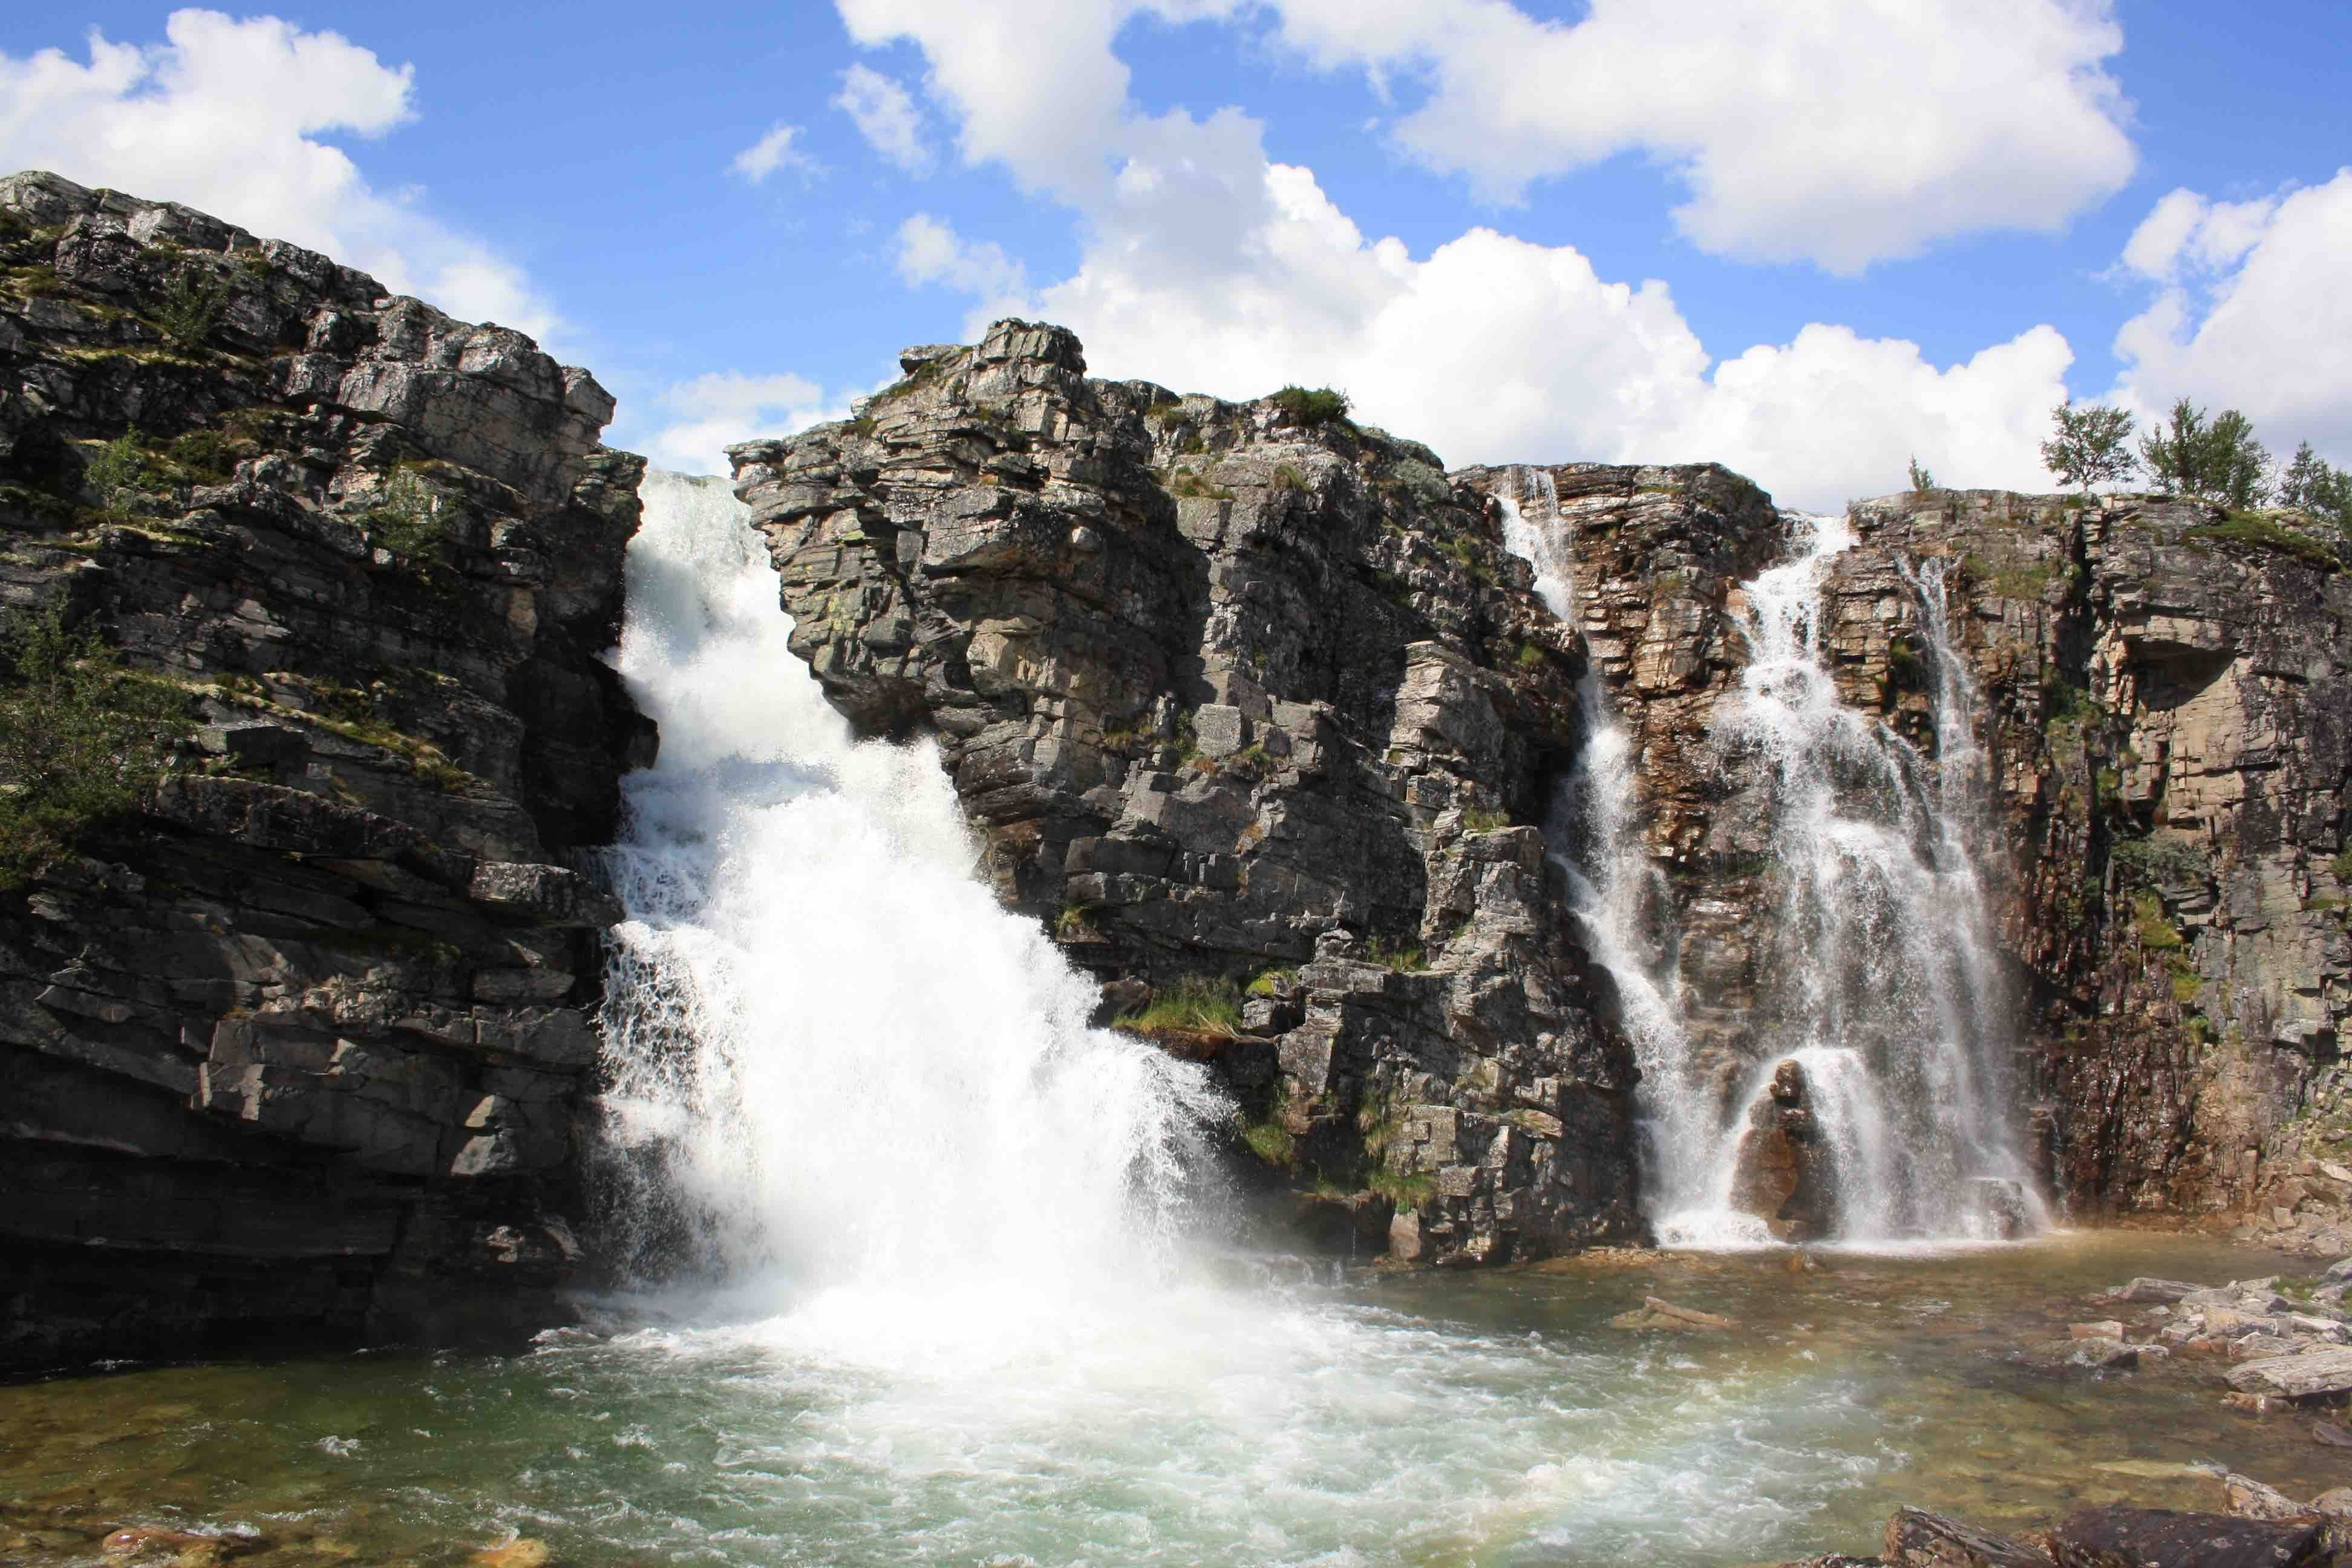 © Rondane Høyfjellshotell, Rondane Høyfjellshotell